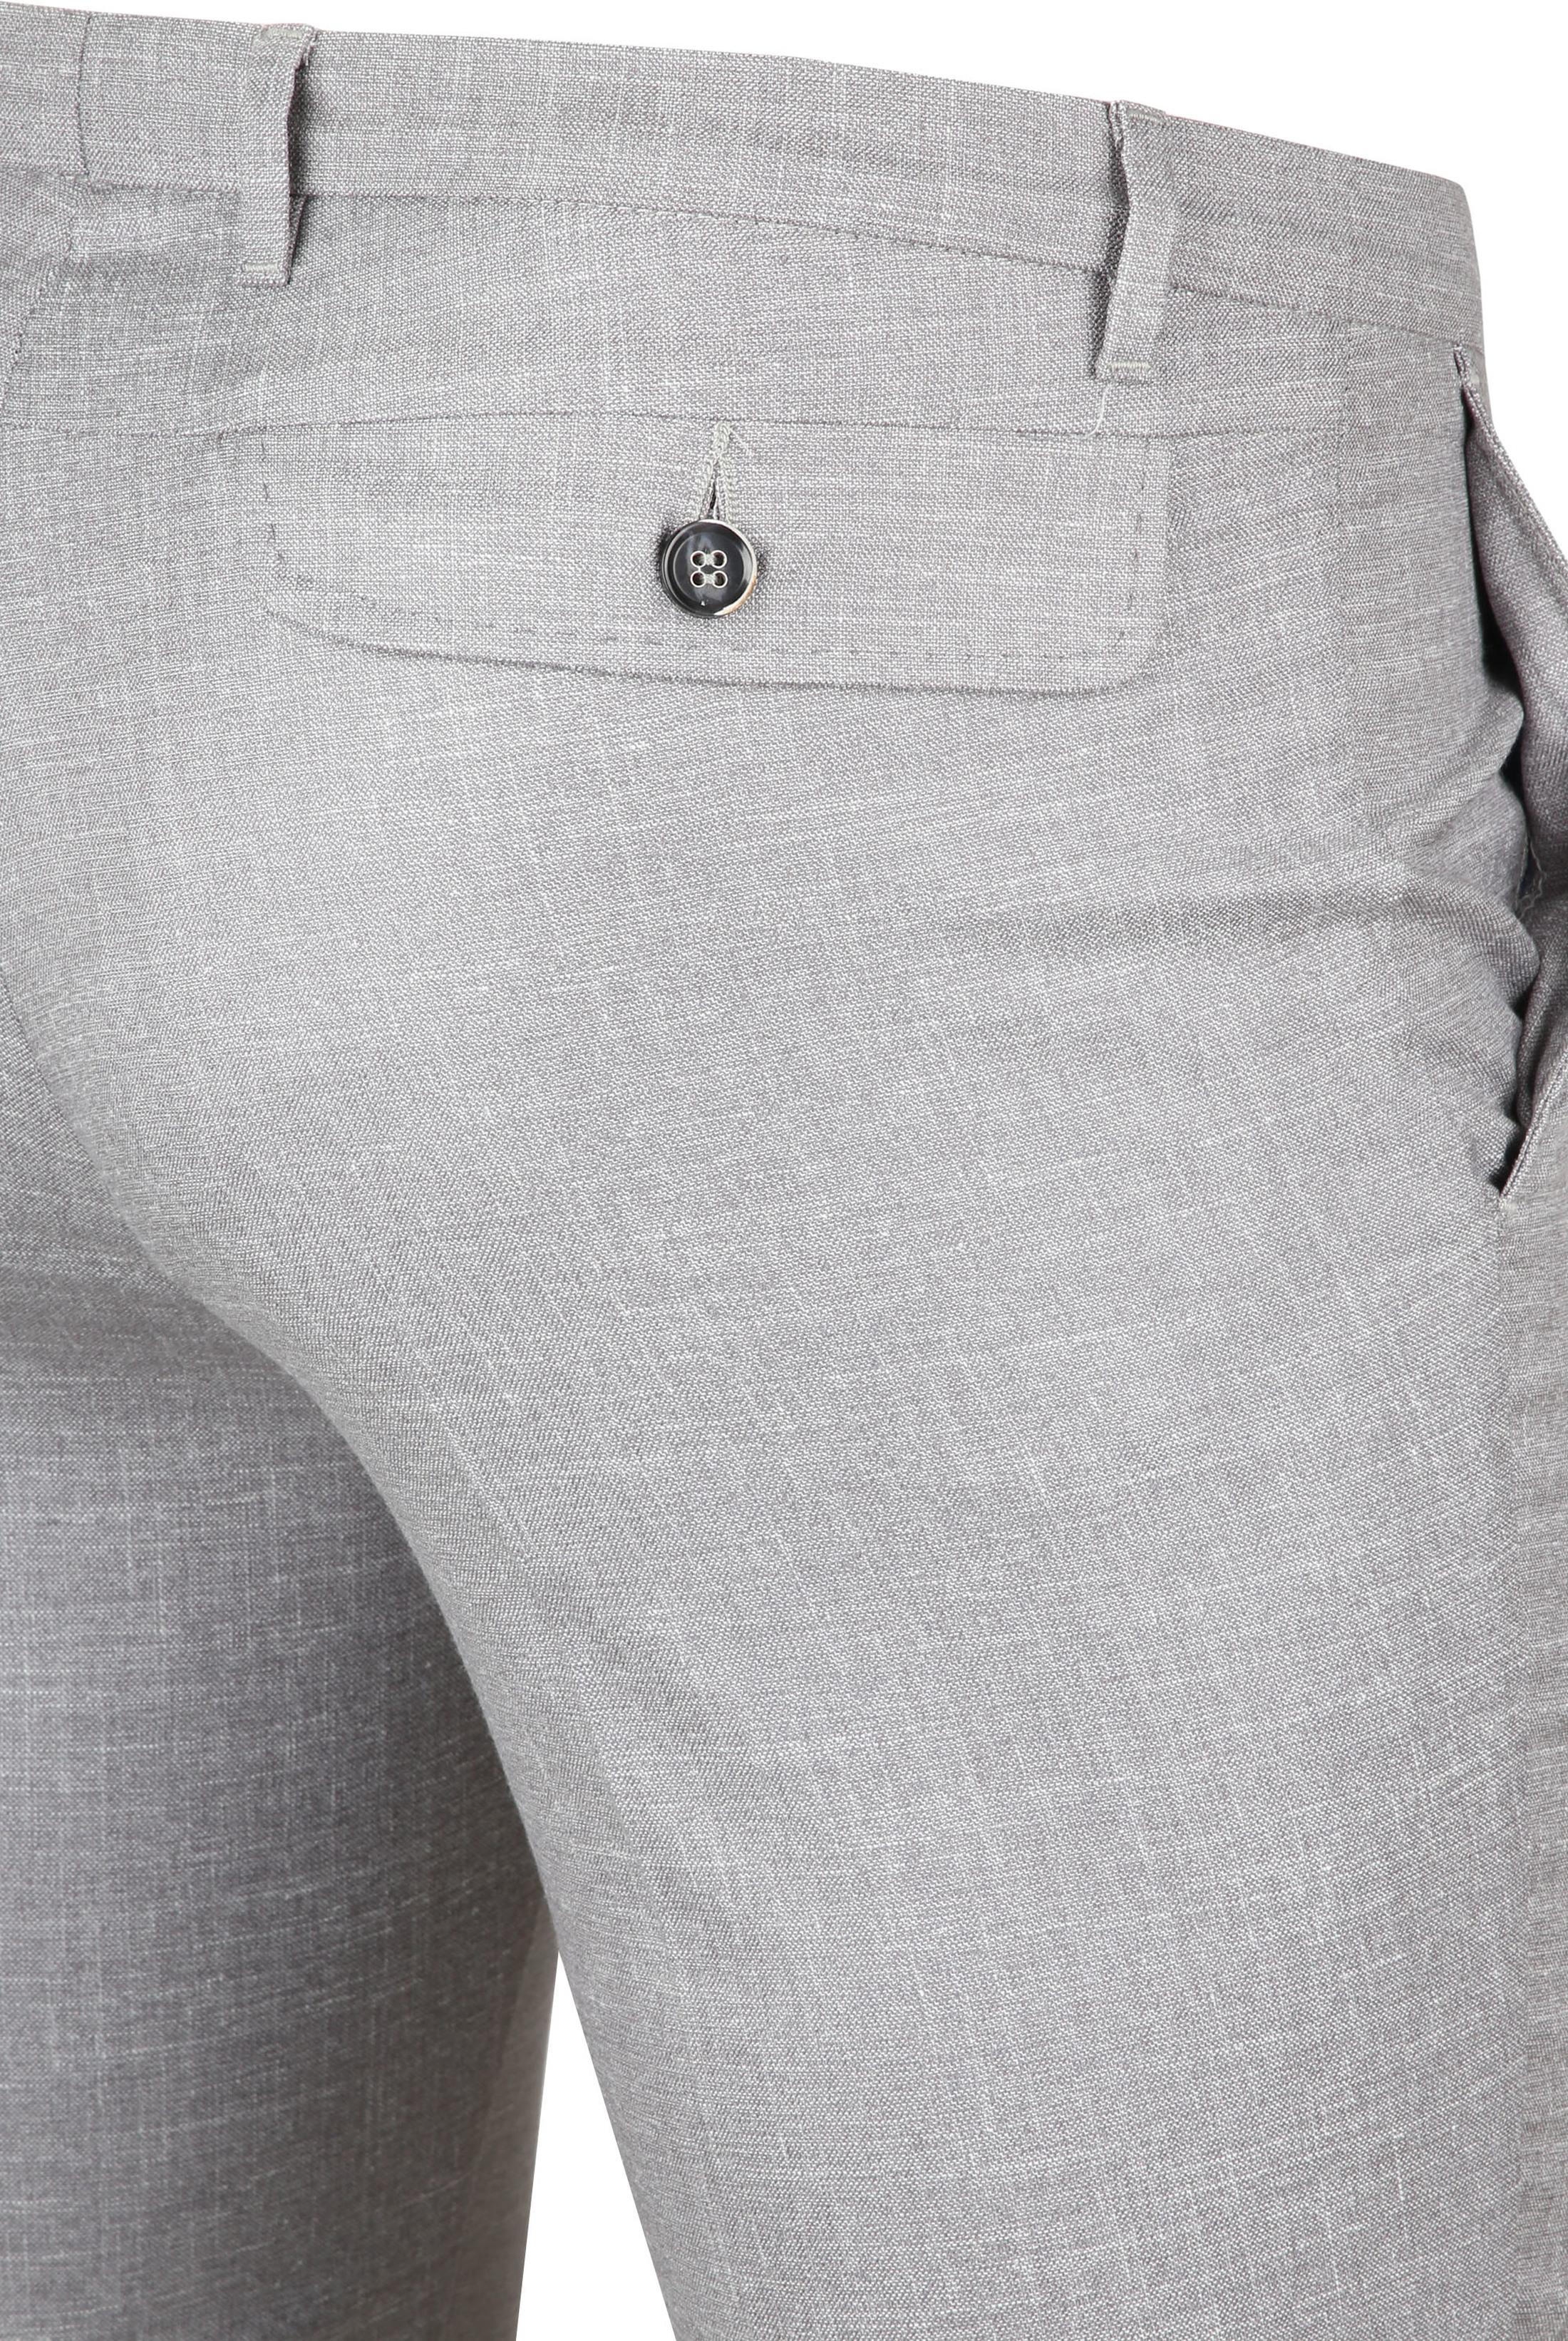 Suitable Pantalon Pisa Melange Grau foto 1